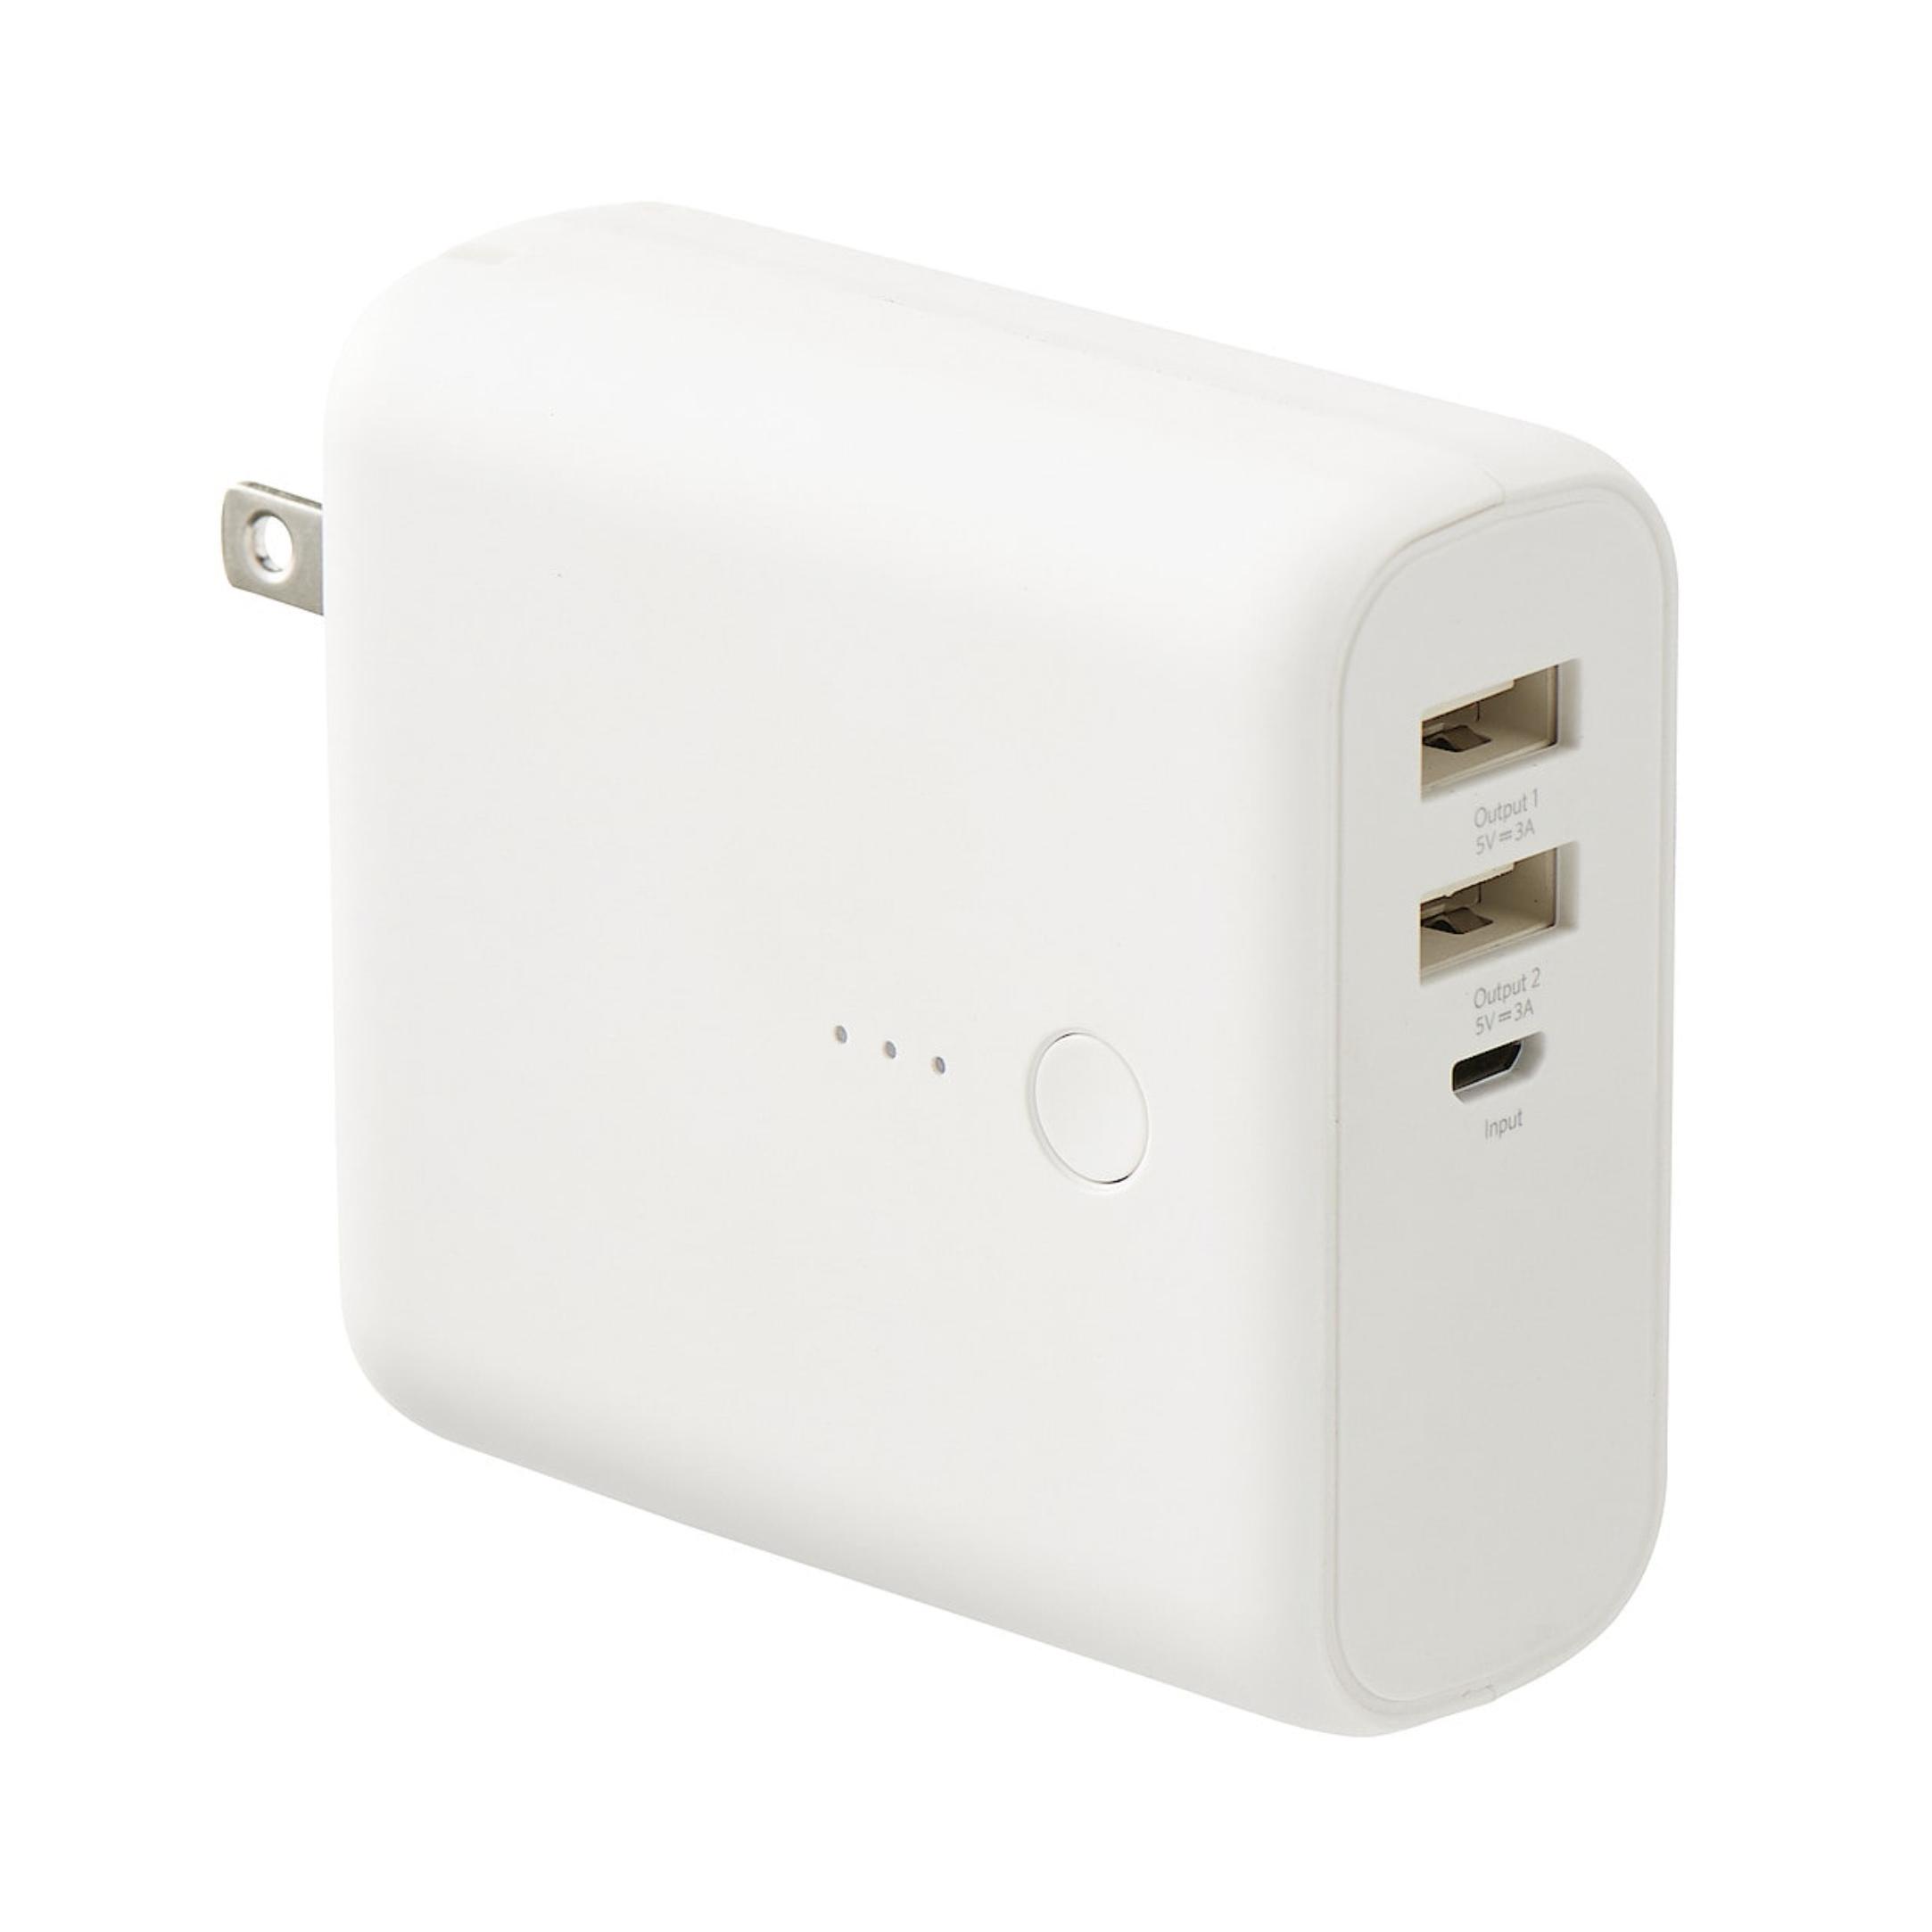 USB用モバイルバッテリー・急速充電器付 MJ-PSMB1